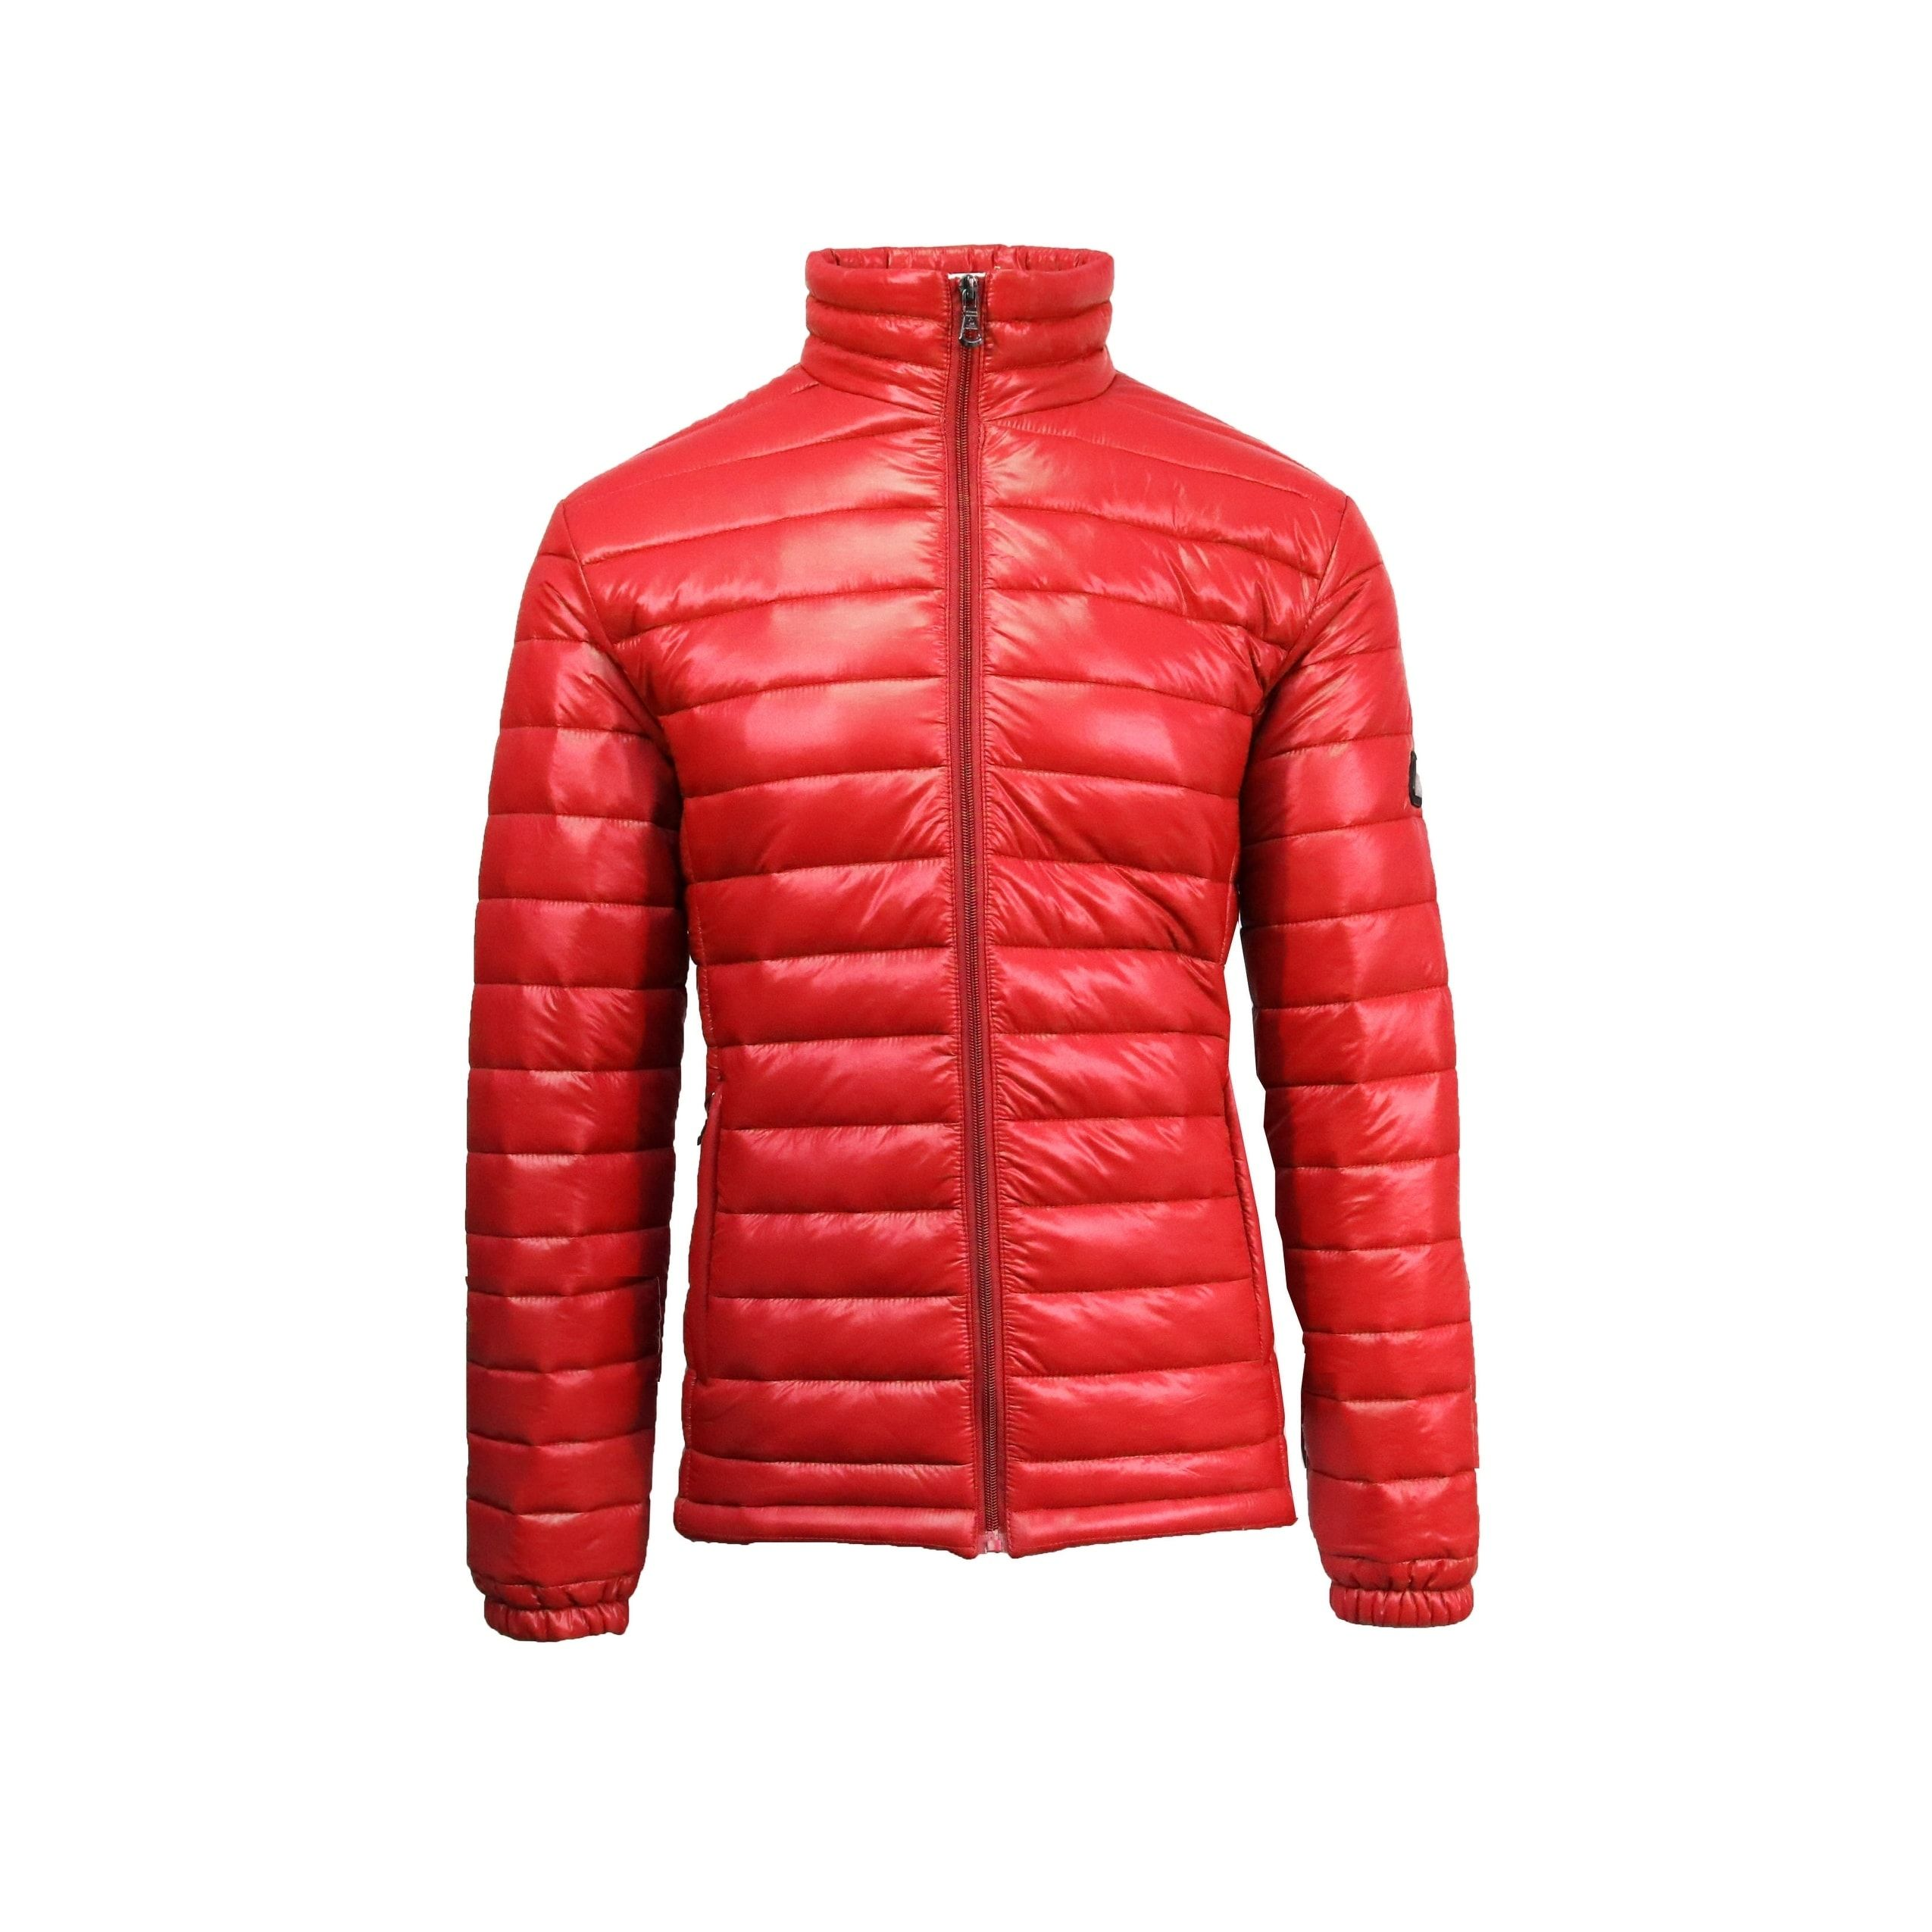 Spire By Galaxy Men's Puffer Jacket Full Zip Best mens